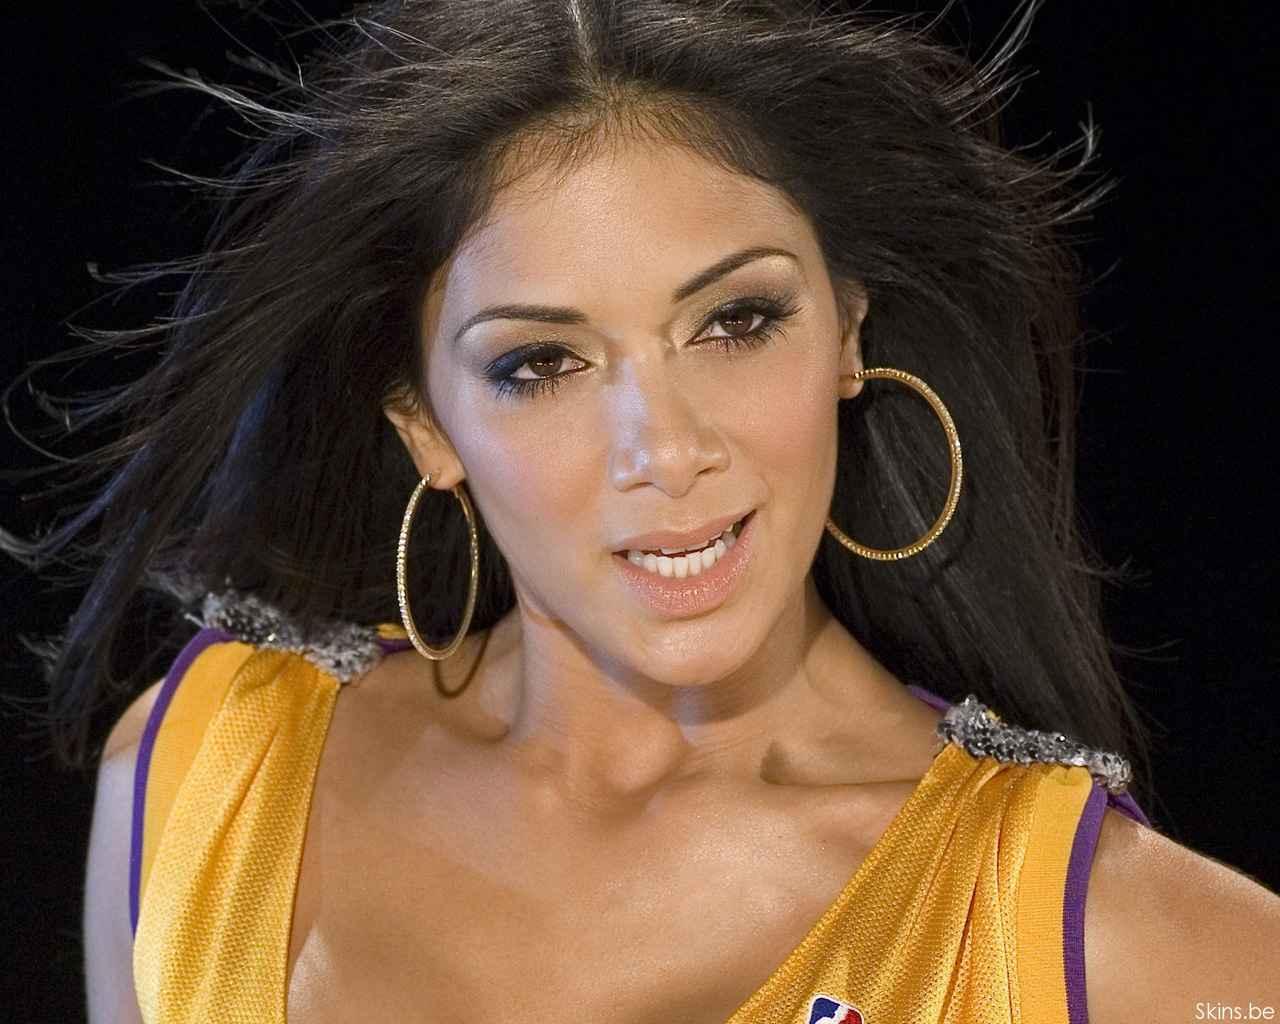 http://1.bp.blogspot.com/-taI1UCYGpdA/Ti7fBFEkCwI/AAAAAAAAKPg/oBlra_p4dMU/s1600/Nicole+-Scherzinger+-11.jpg